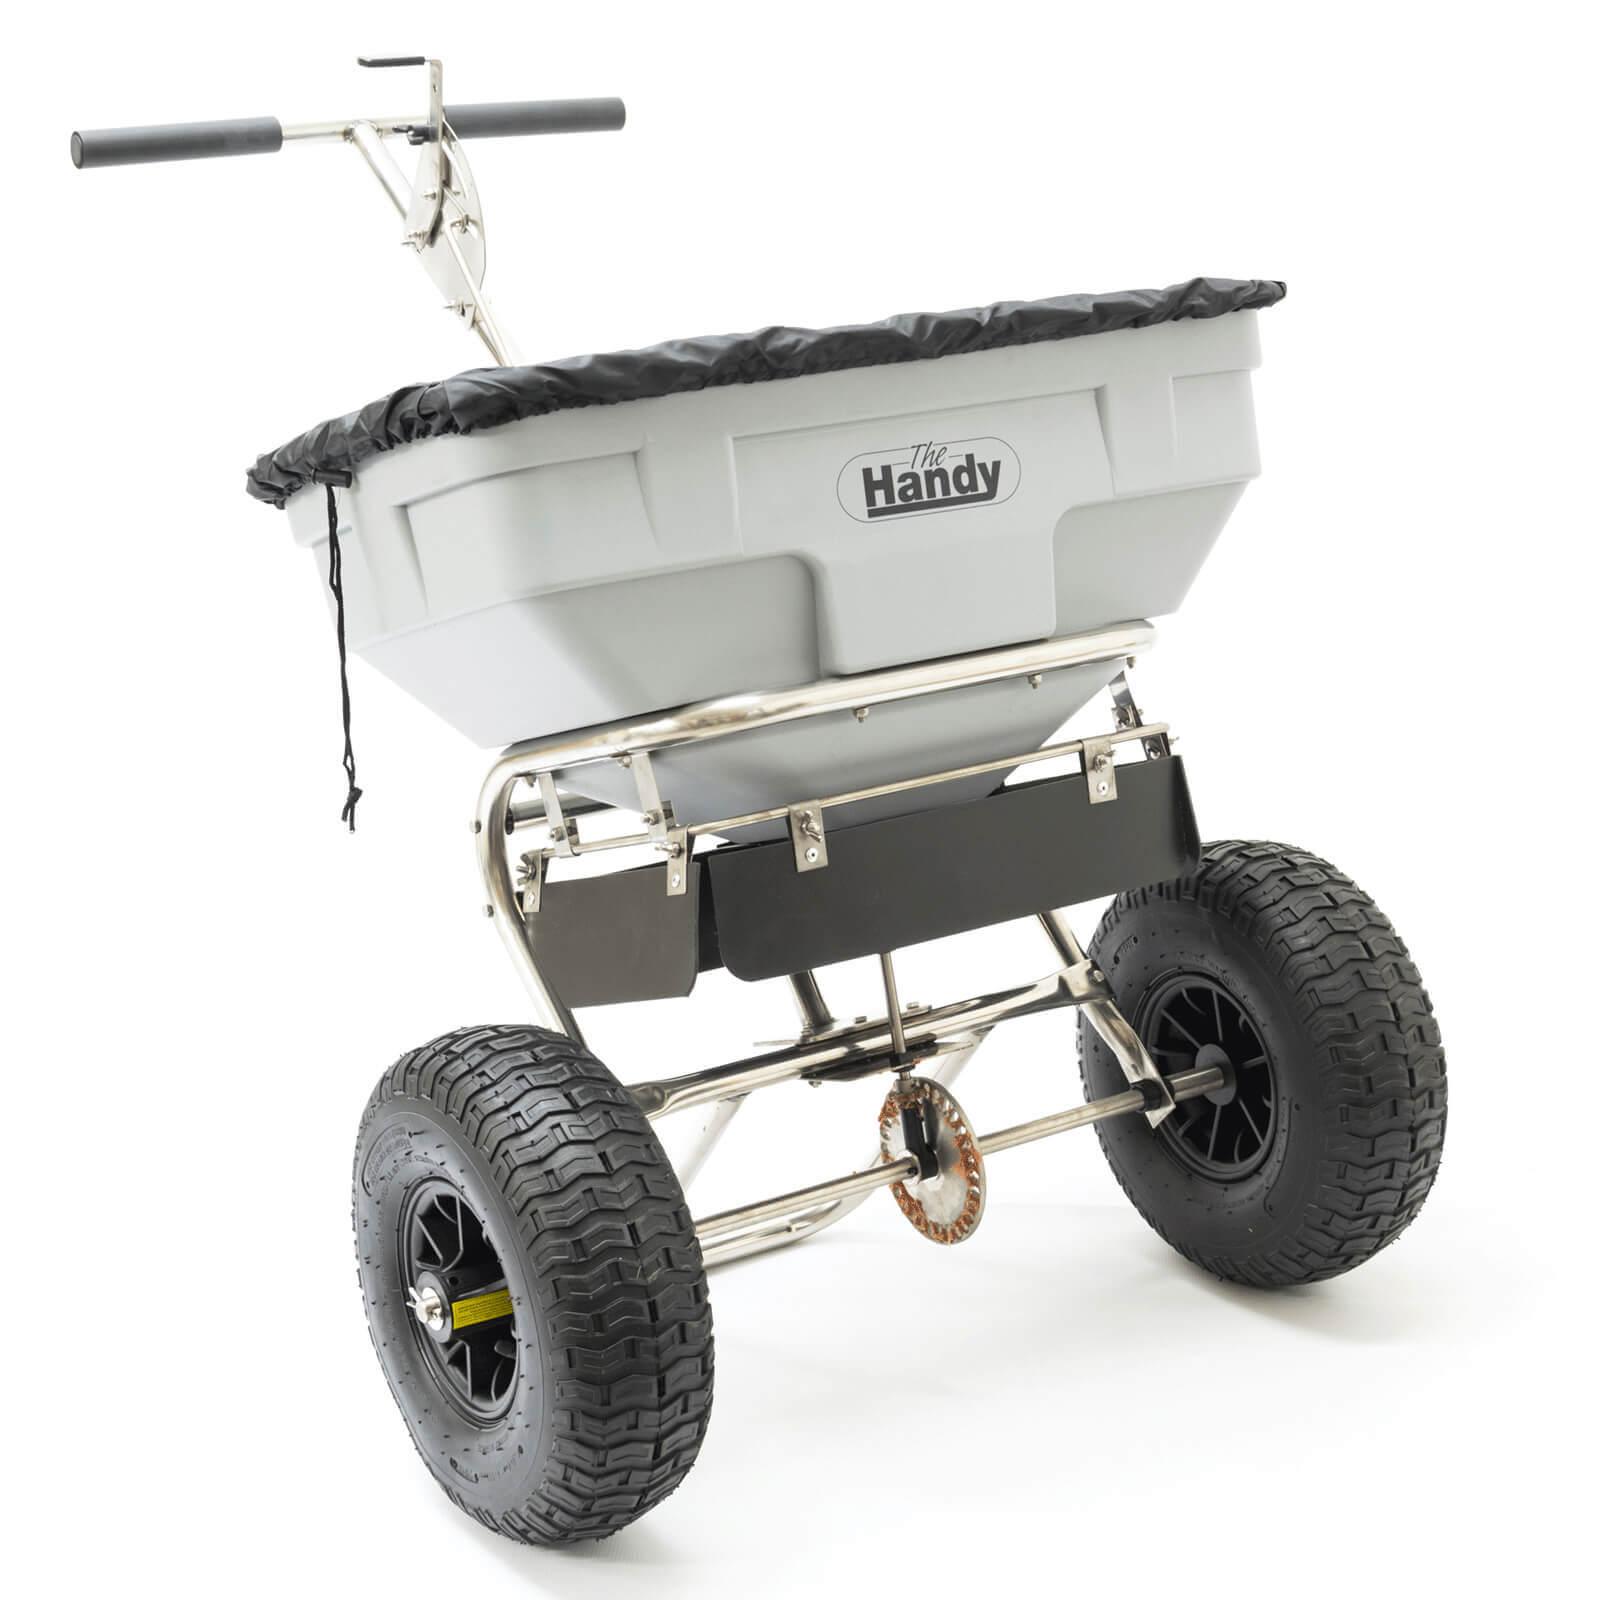 Handy Stainless Steel Push Grass, Feed & Salt Broadcast Spreader 3.66 Metre Spread Width 57kg Capacity